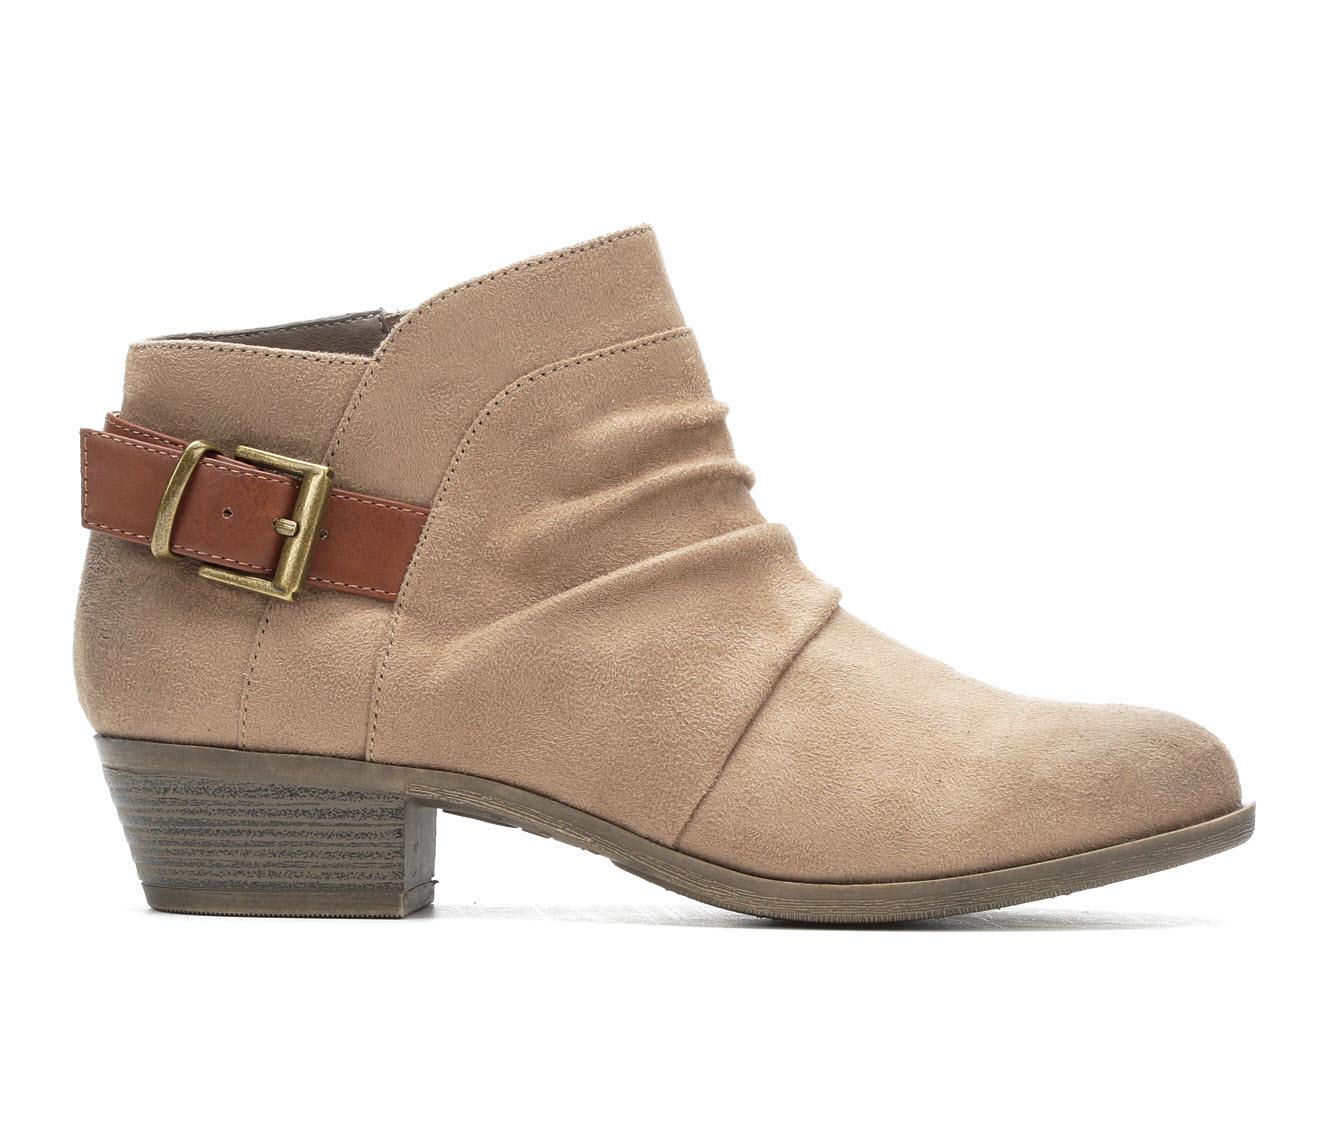 No Parking Ailey Women's Boots (Beige - Faux Leather)